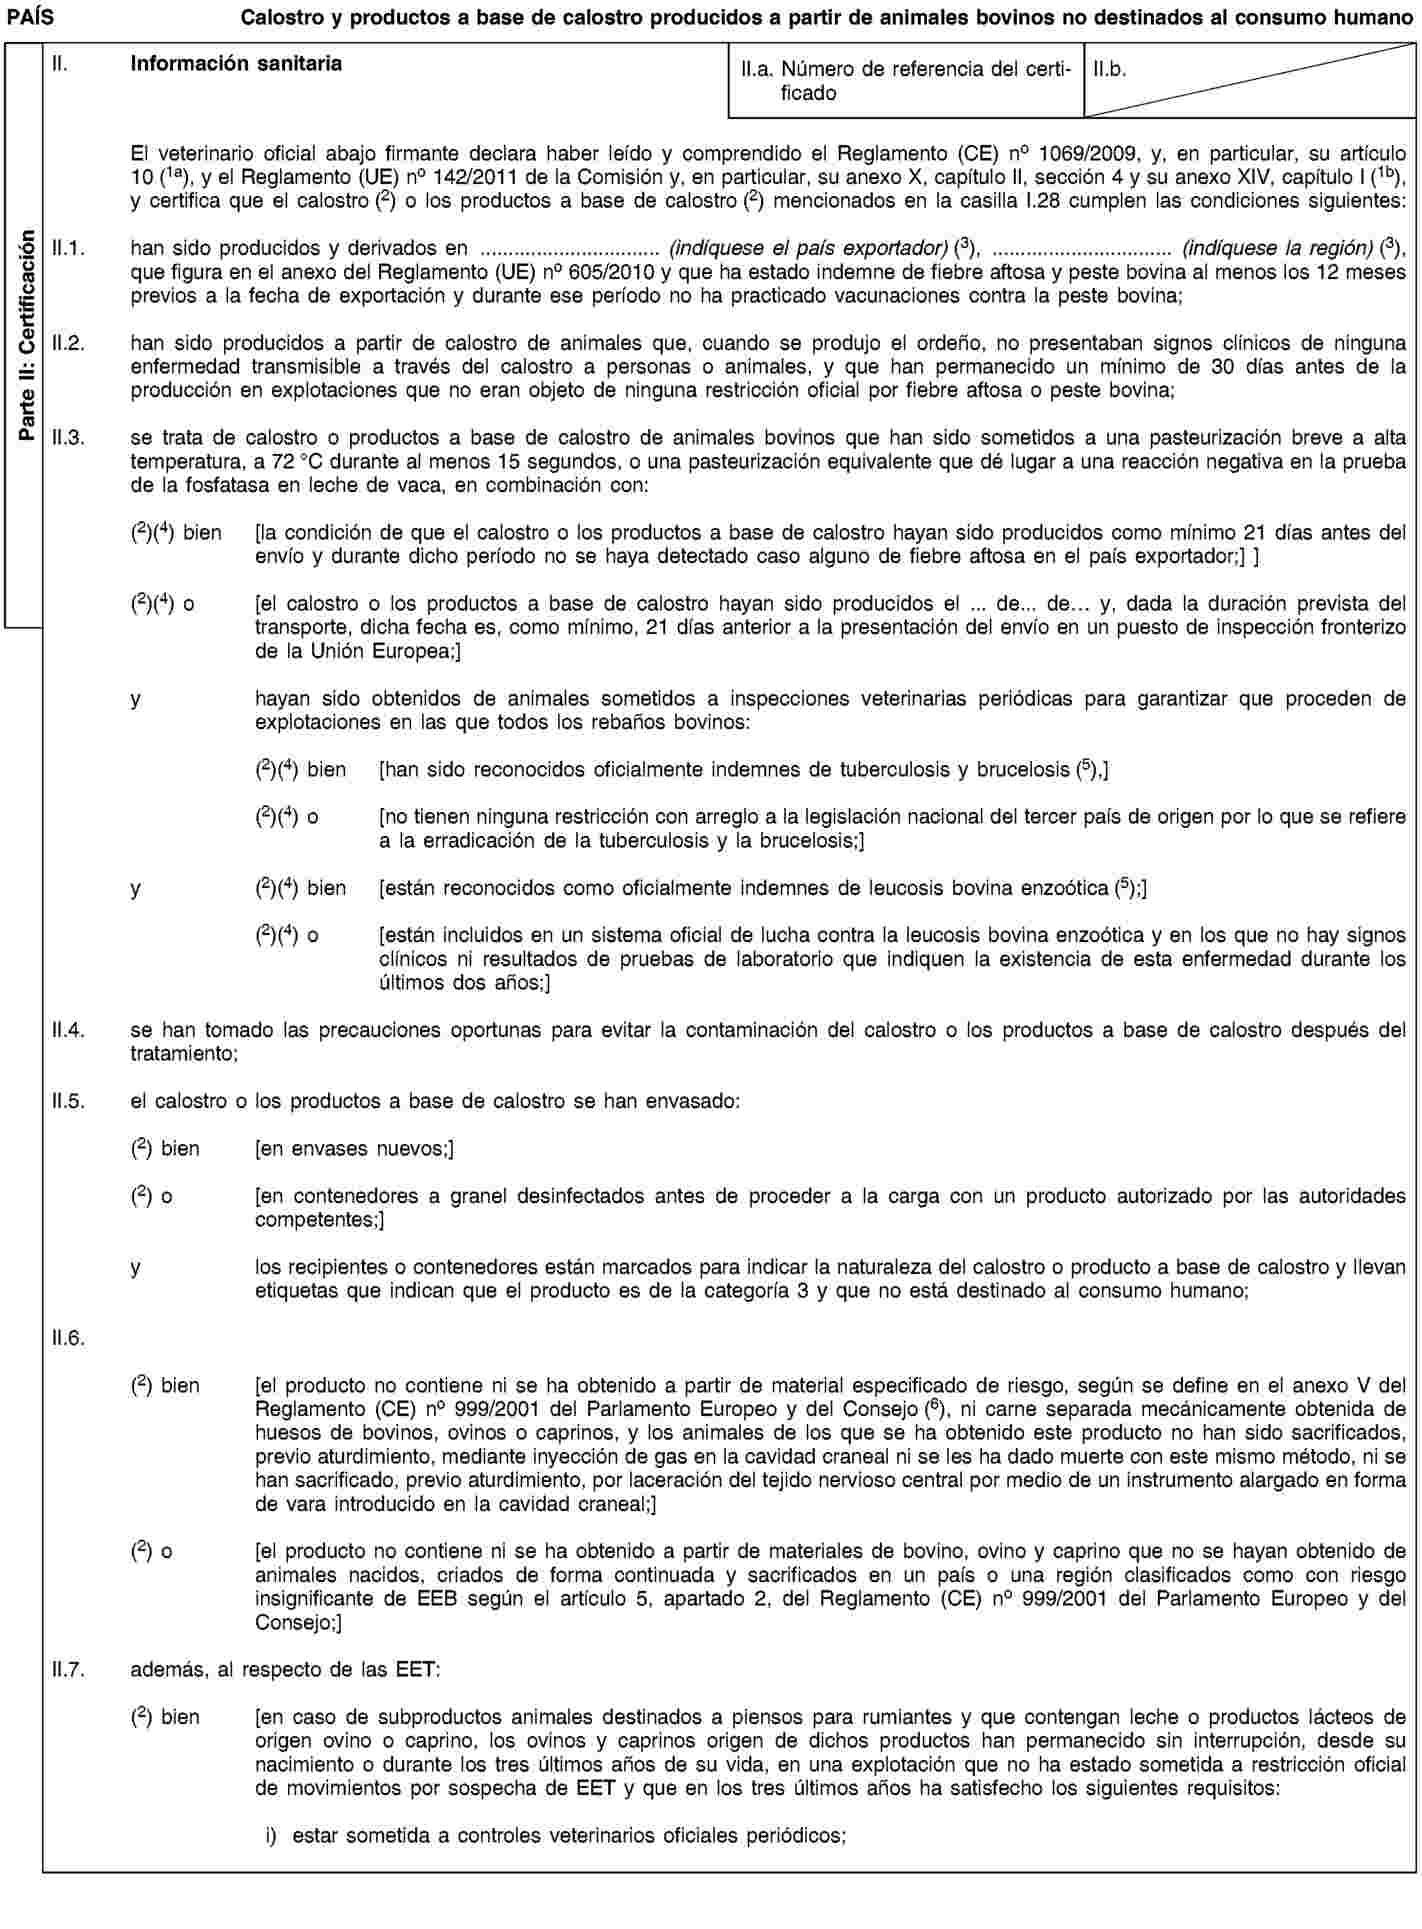 Imagen: https://eur-lex.europa.eu/resource.html?uri=uriserv:OJ.L_.2011.054.01.0001.01.SPA.xhtml.L_2011054ES.01012901.tif.jpg